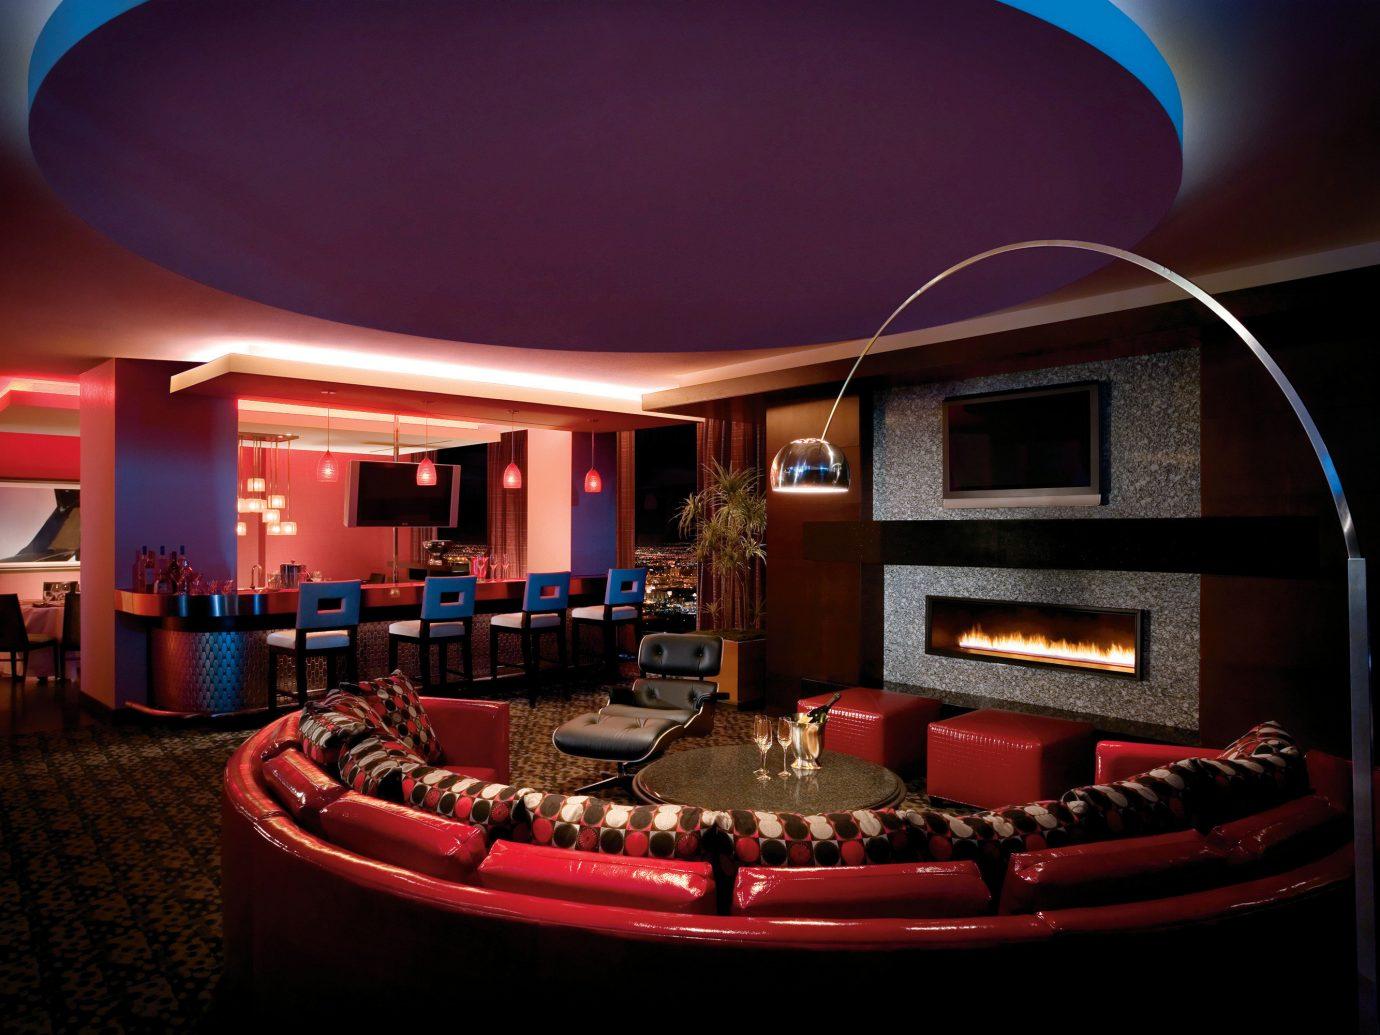 Movie theater in the Sky Villa, Palms Casino Resort in Las Vegas